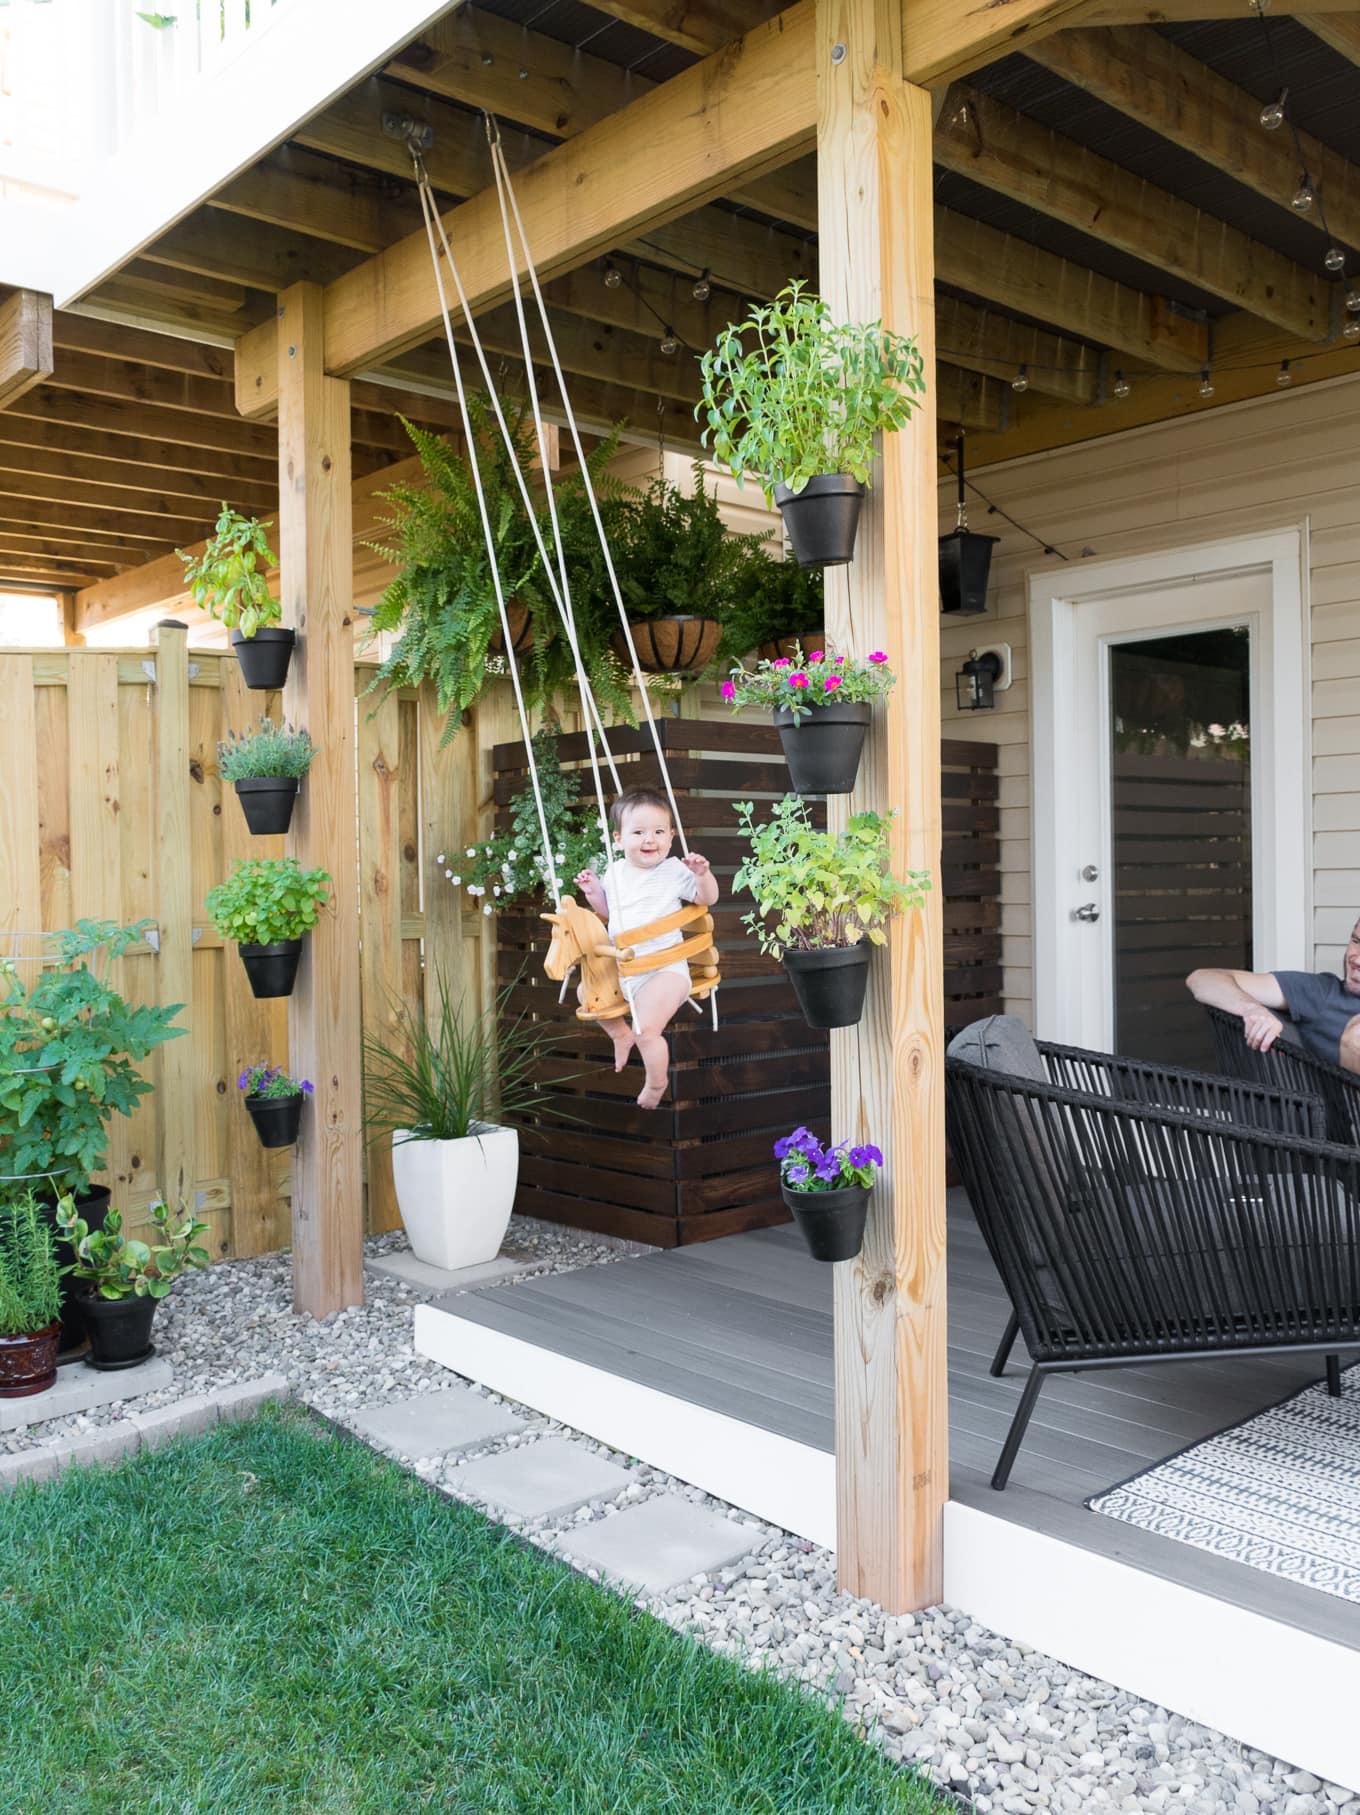 Tiny Backyard Ideas & An Update on My Tiny Backyard & Garden on Townhouse Patio Ideas id=93336